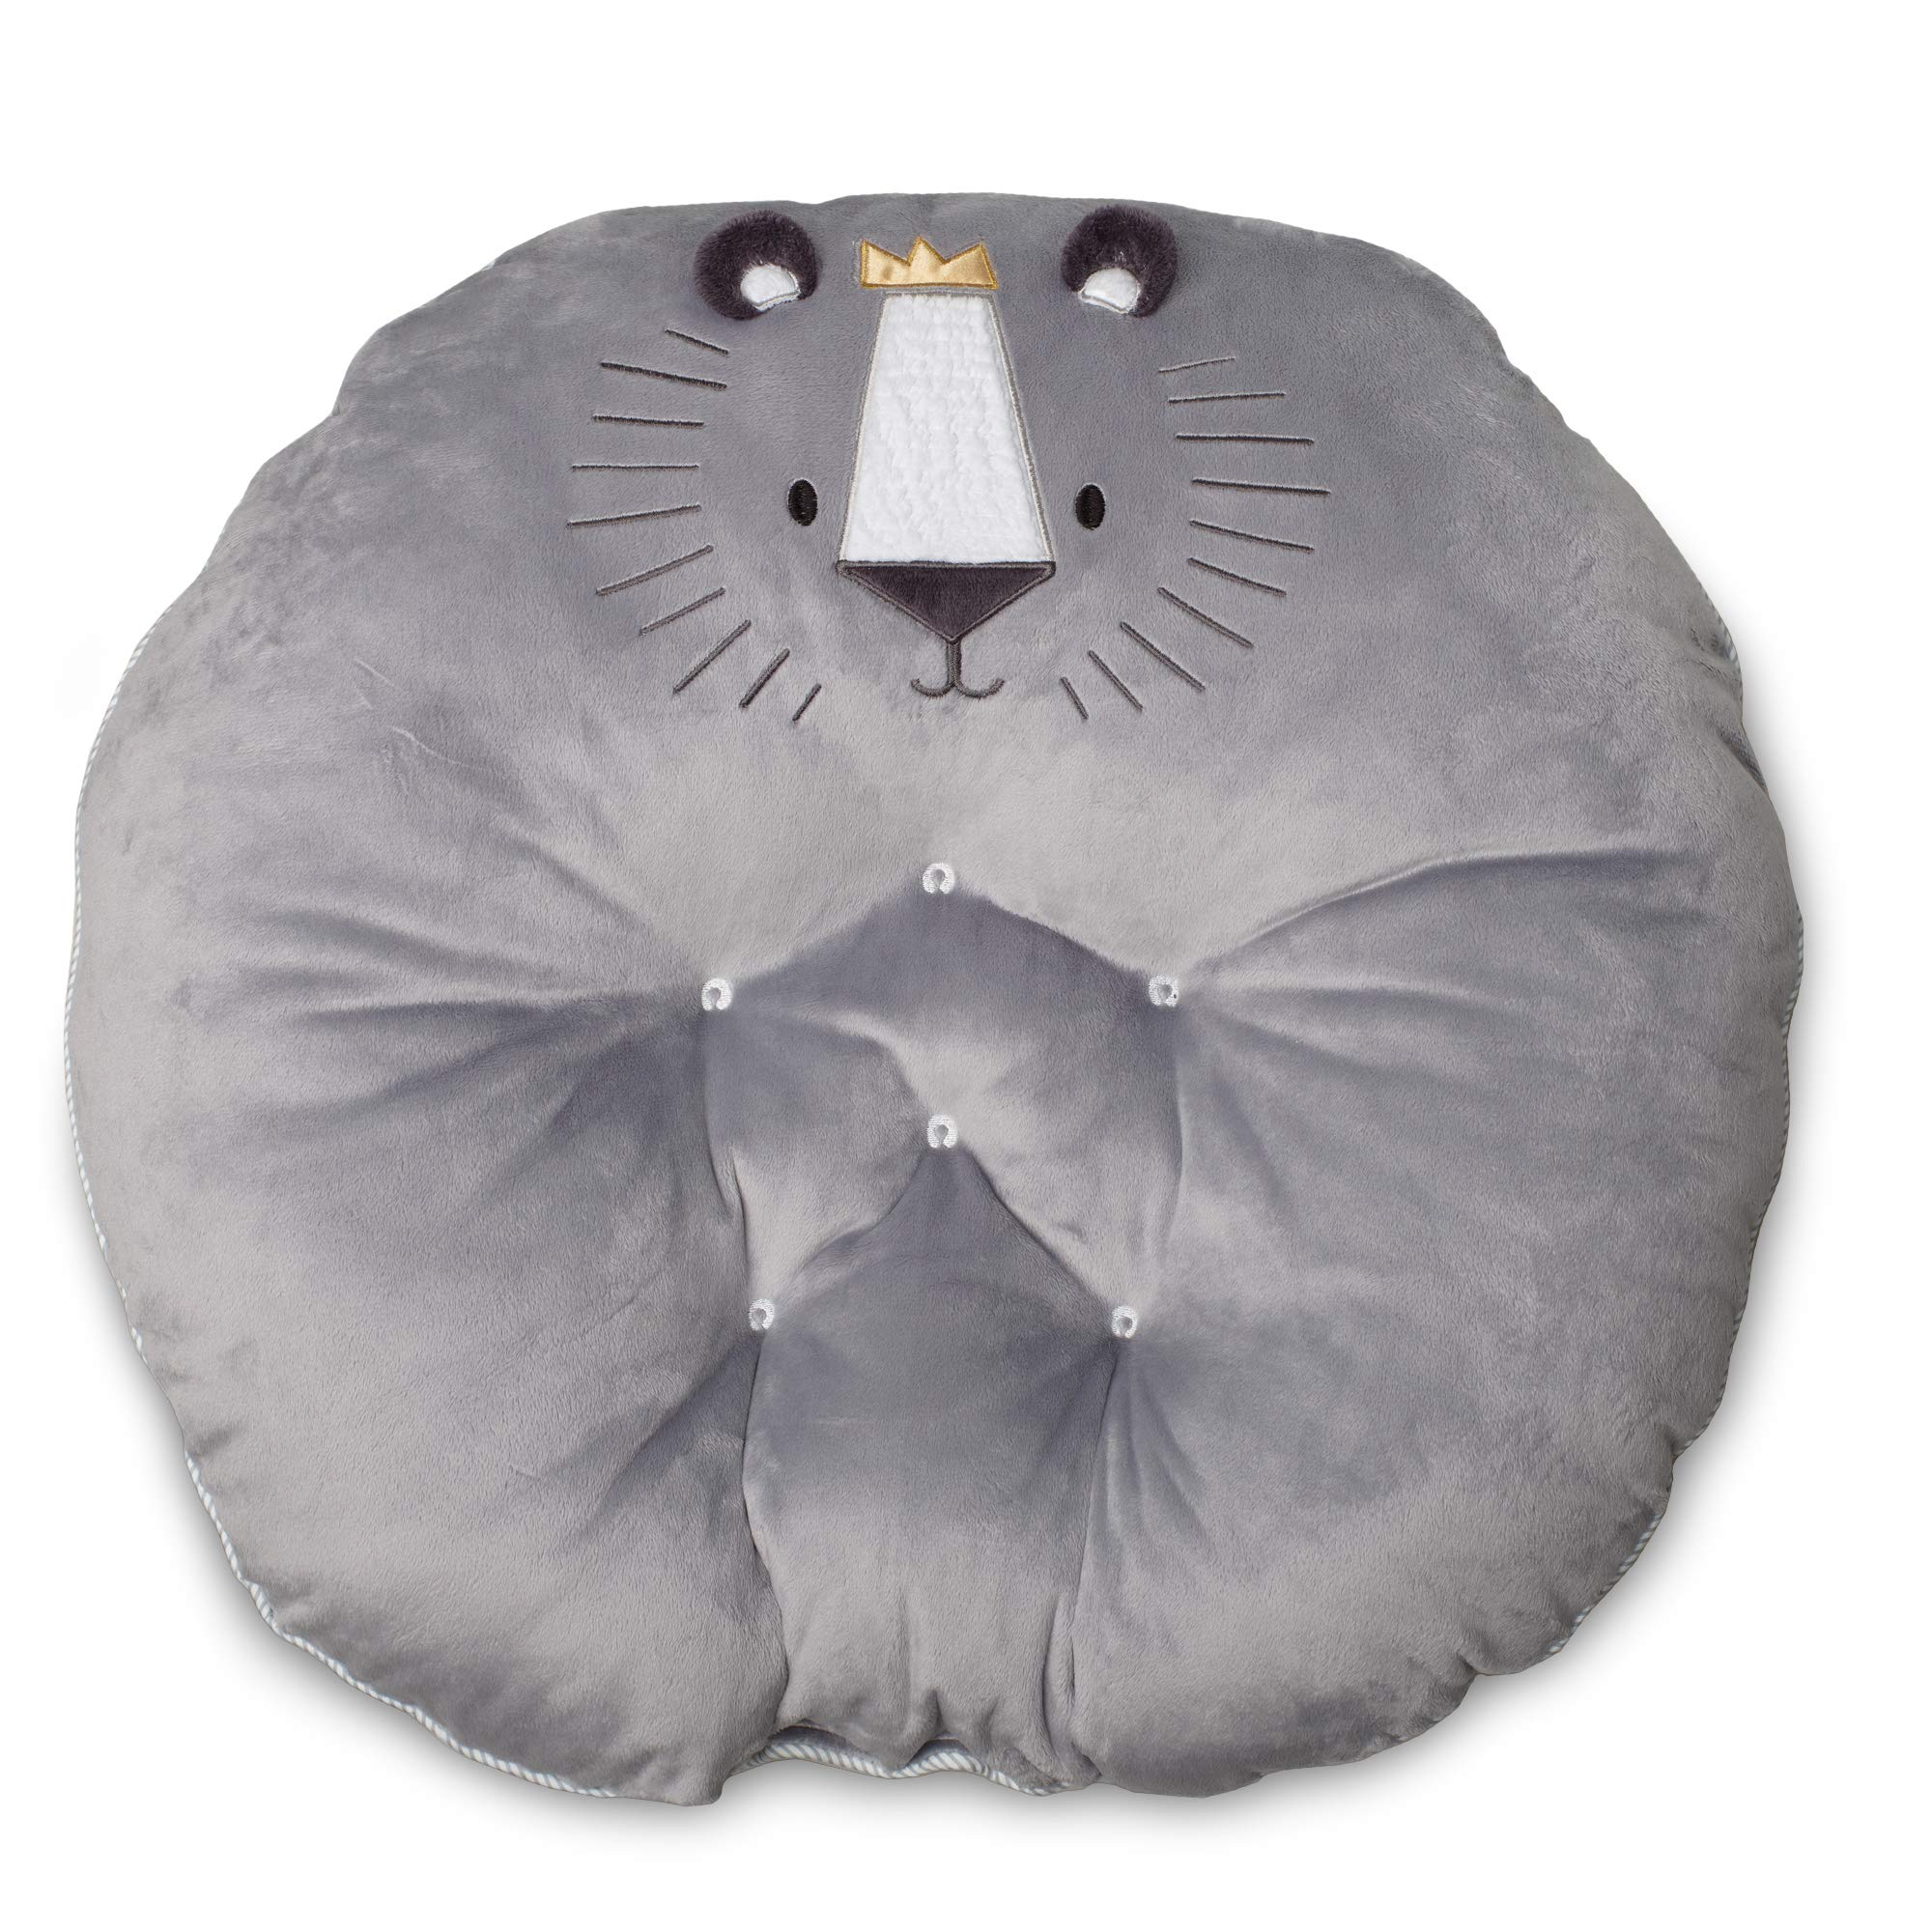 Boppy Preferred Newborn Lounger, Gray Royal Lion